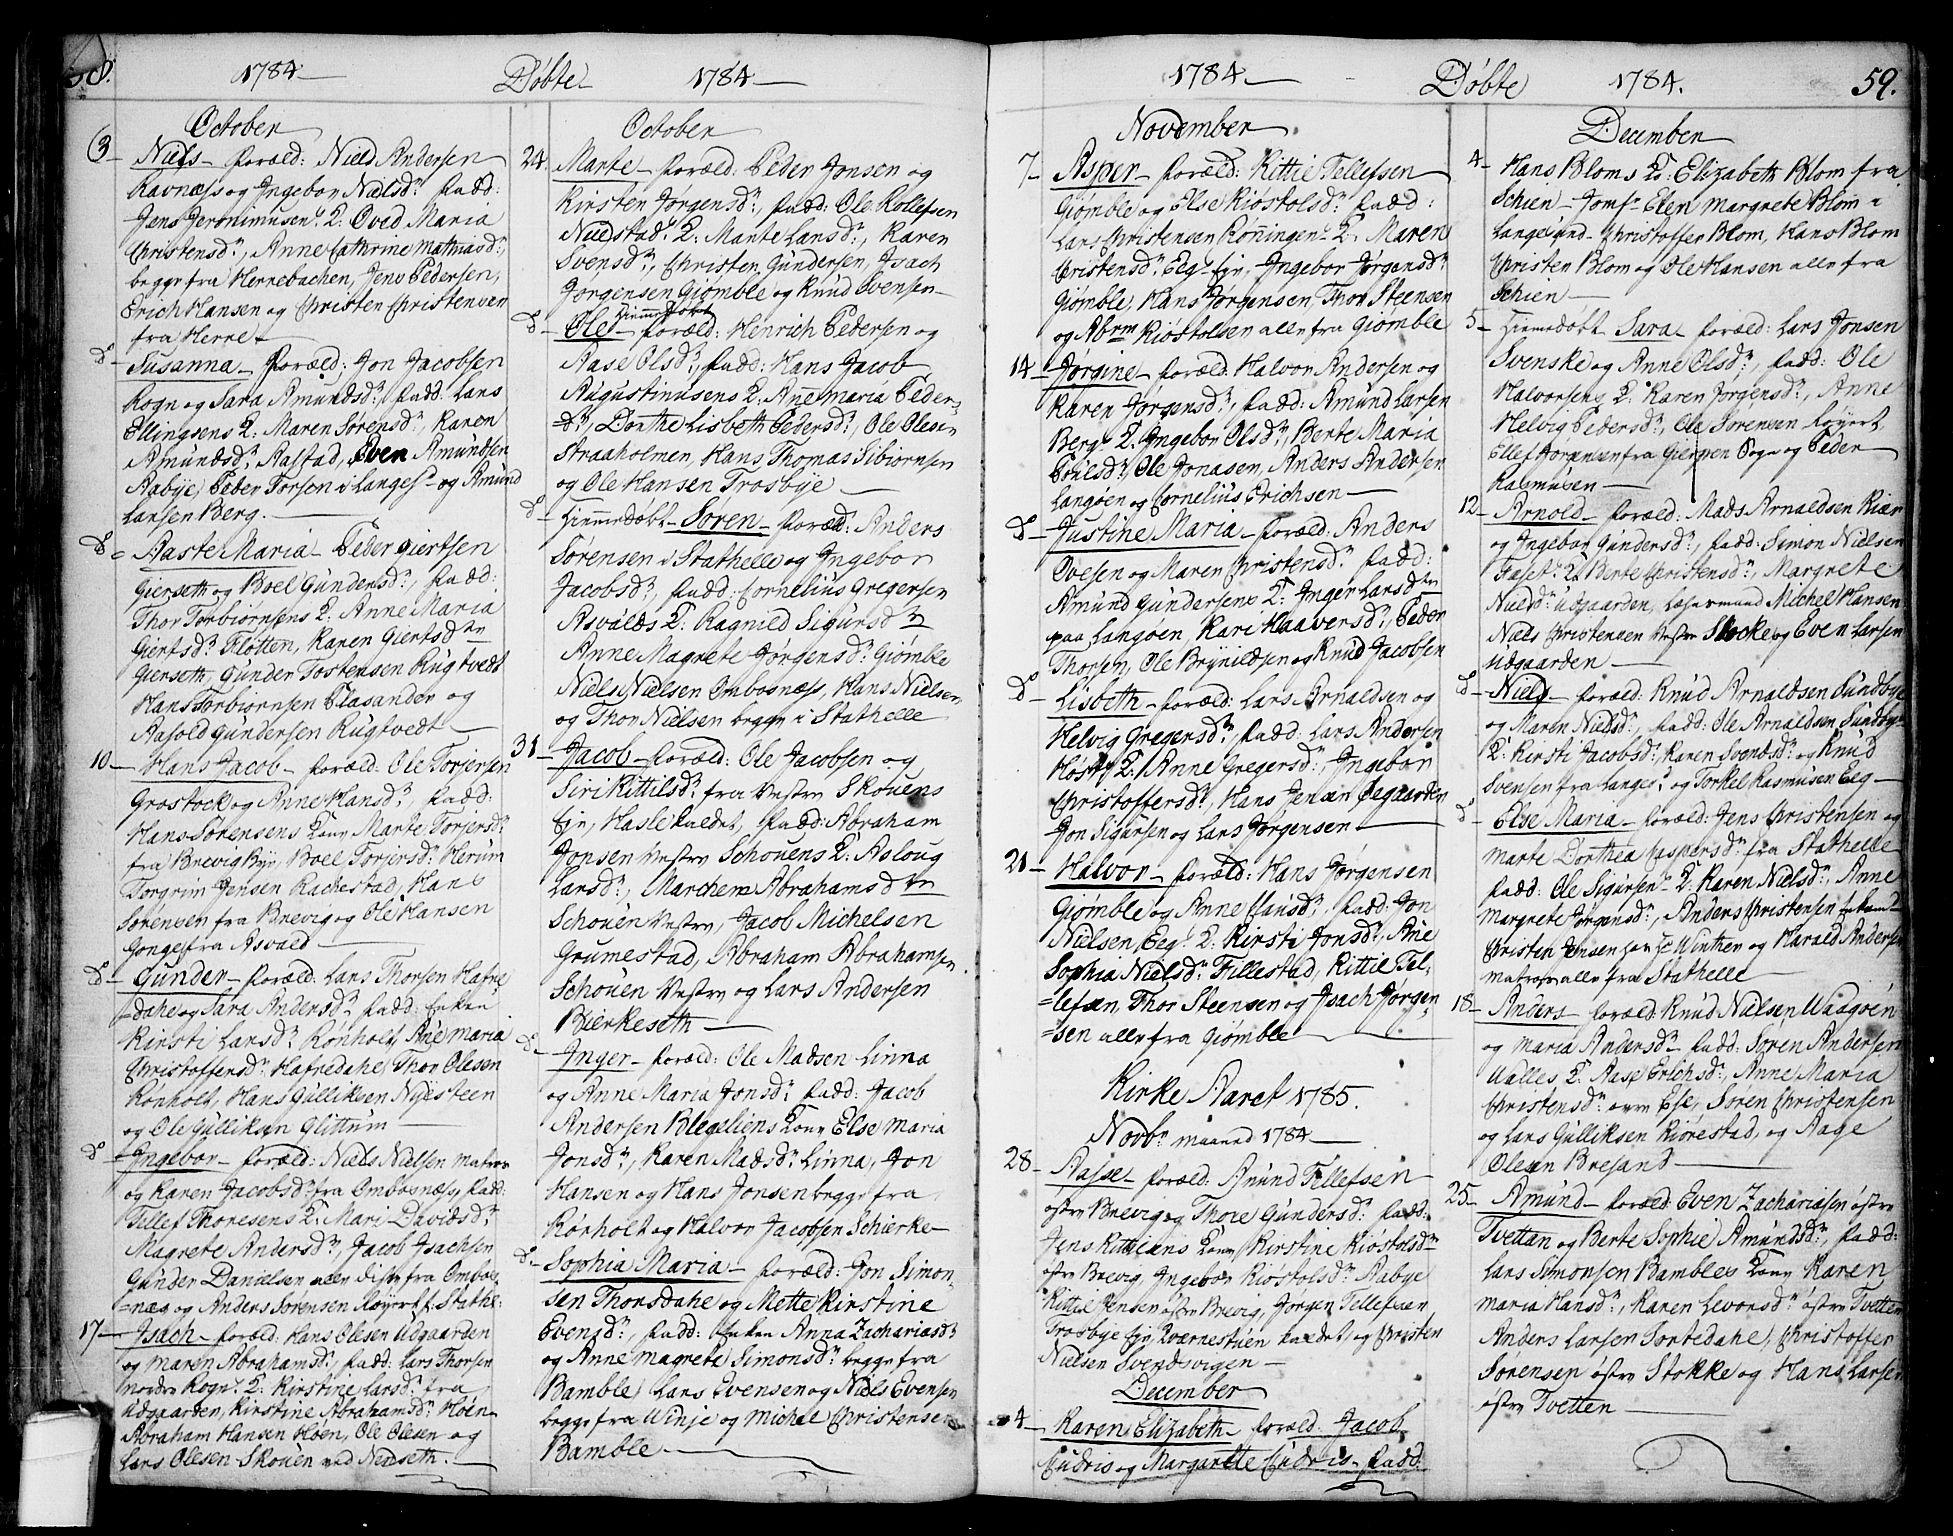 SAKO, Bamble kirkebøker, F/Fa/L0002: Ministerialbok nr. I 2, 1775-1814, s. 58-59